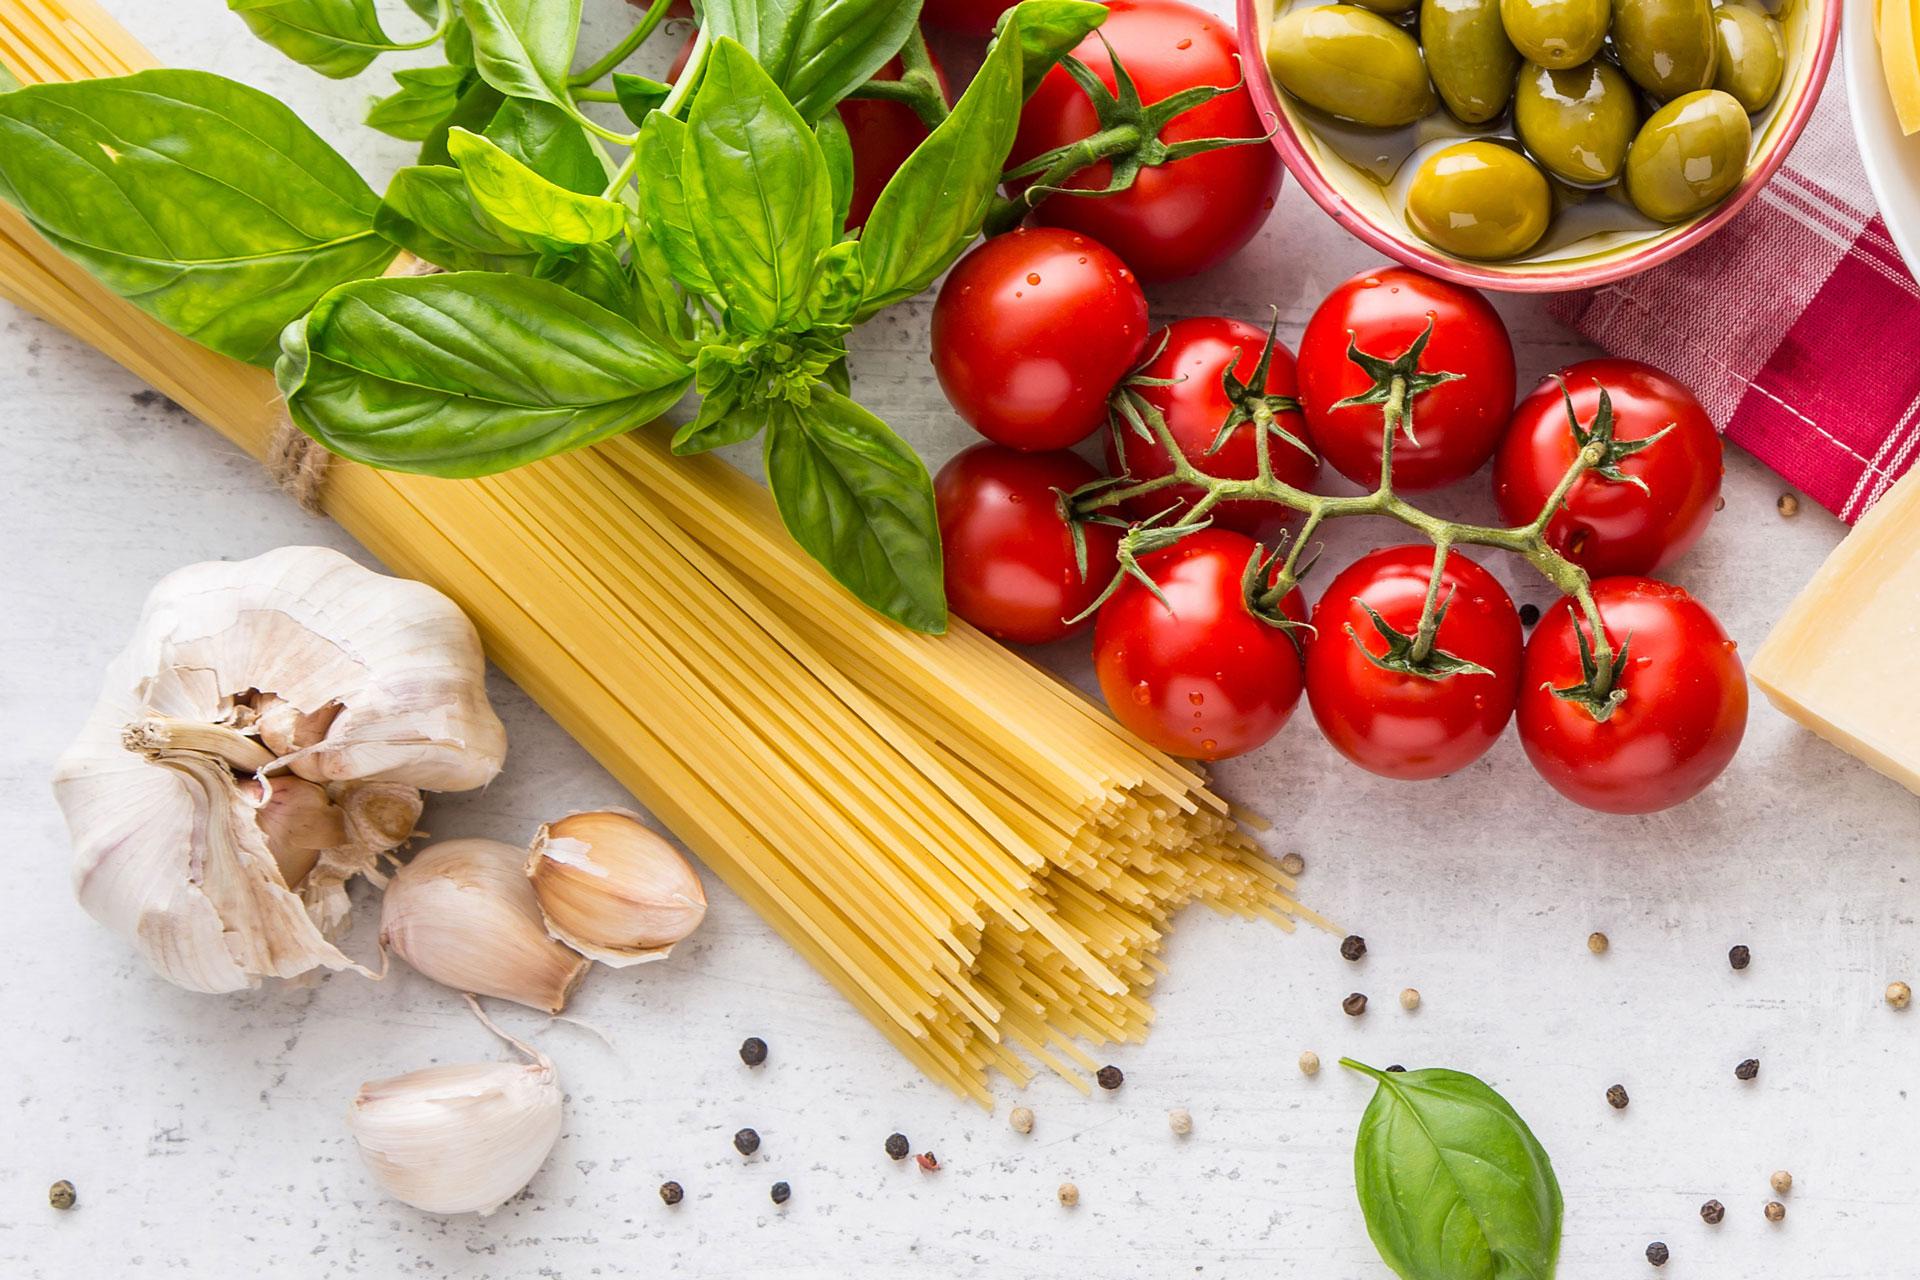 Spaghetti, tomatoes, basil, garlic and olives.